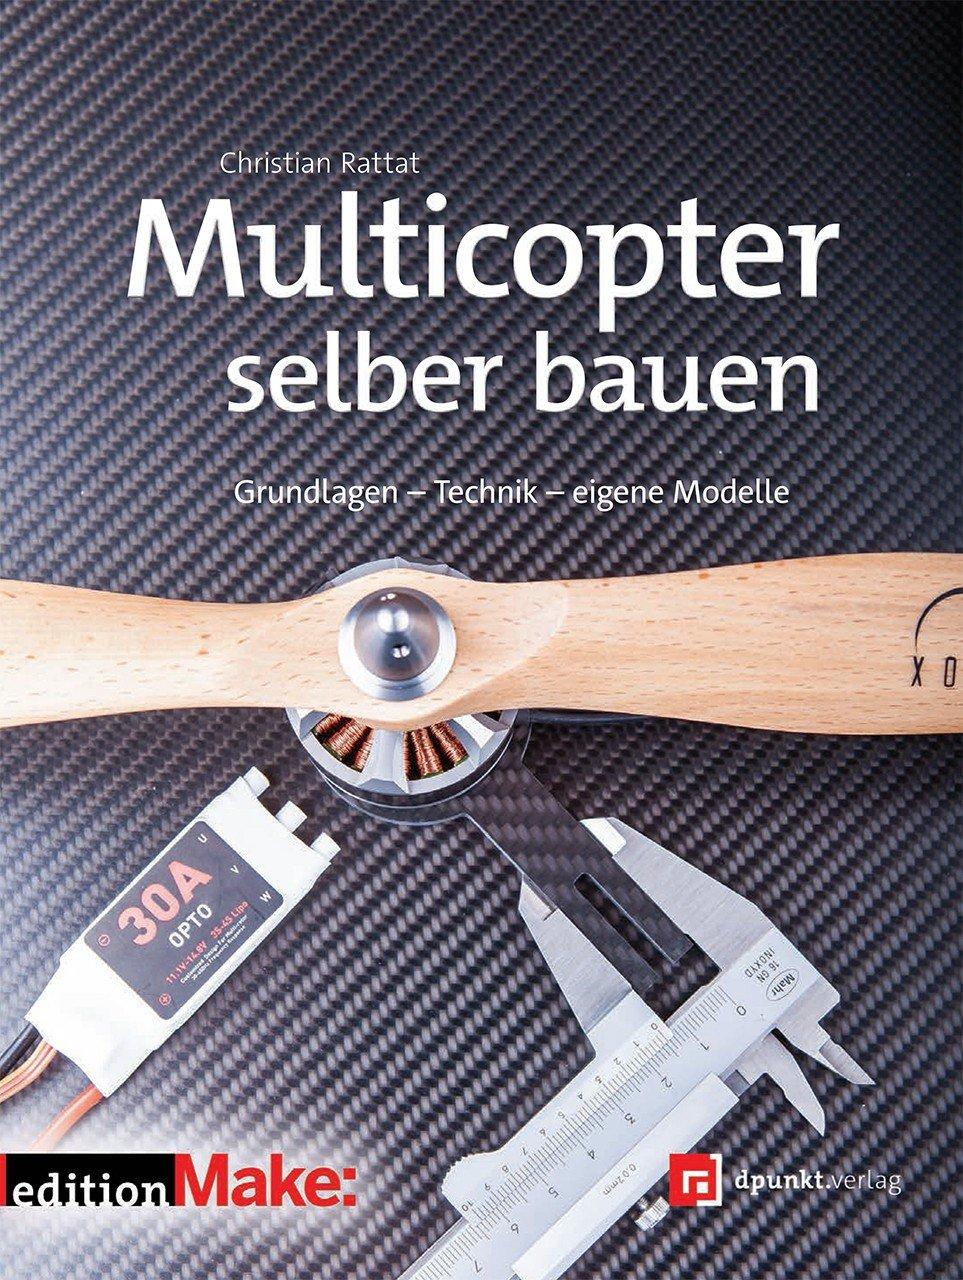 isbn 9783864902475 multicopter selber bauen grundlagen technik eigene modelle neu. Black Bedroom Furniture Sets. Home Design Ideas